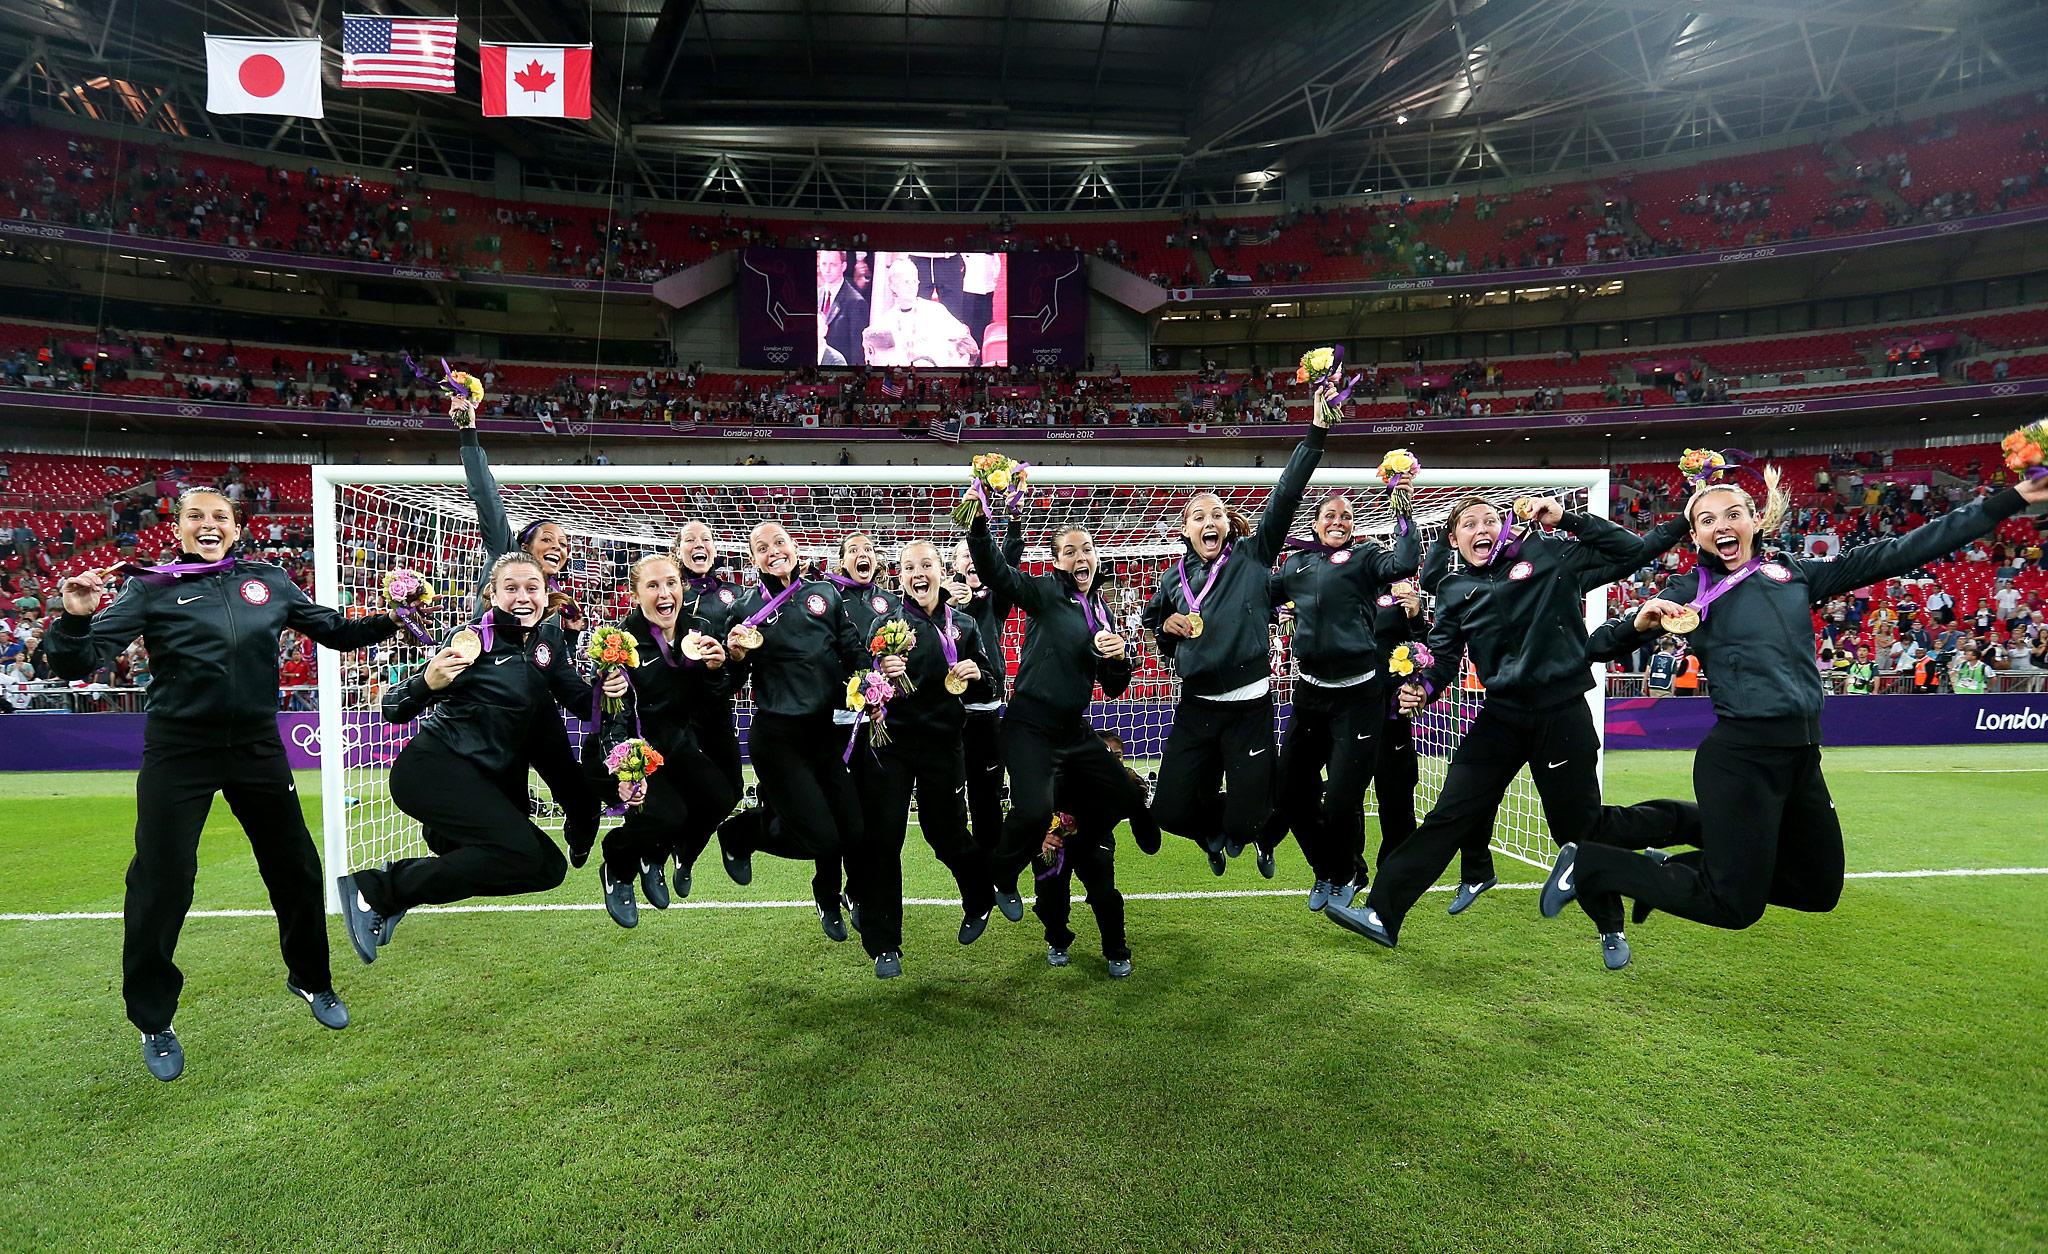 womens soccer team   Top US Women of the Olympics   espnW 2048x1254